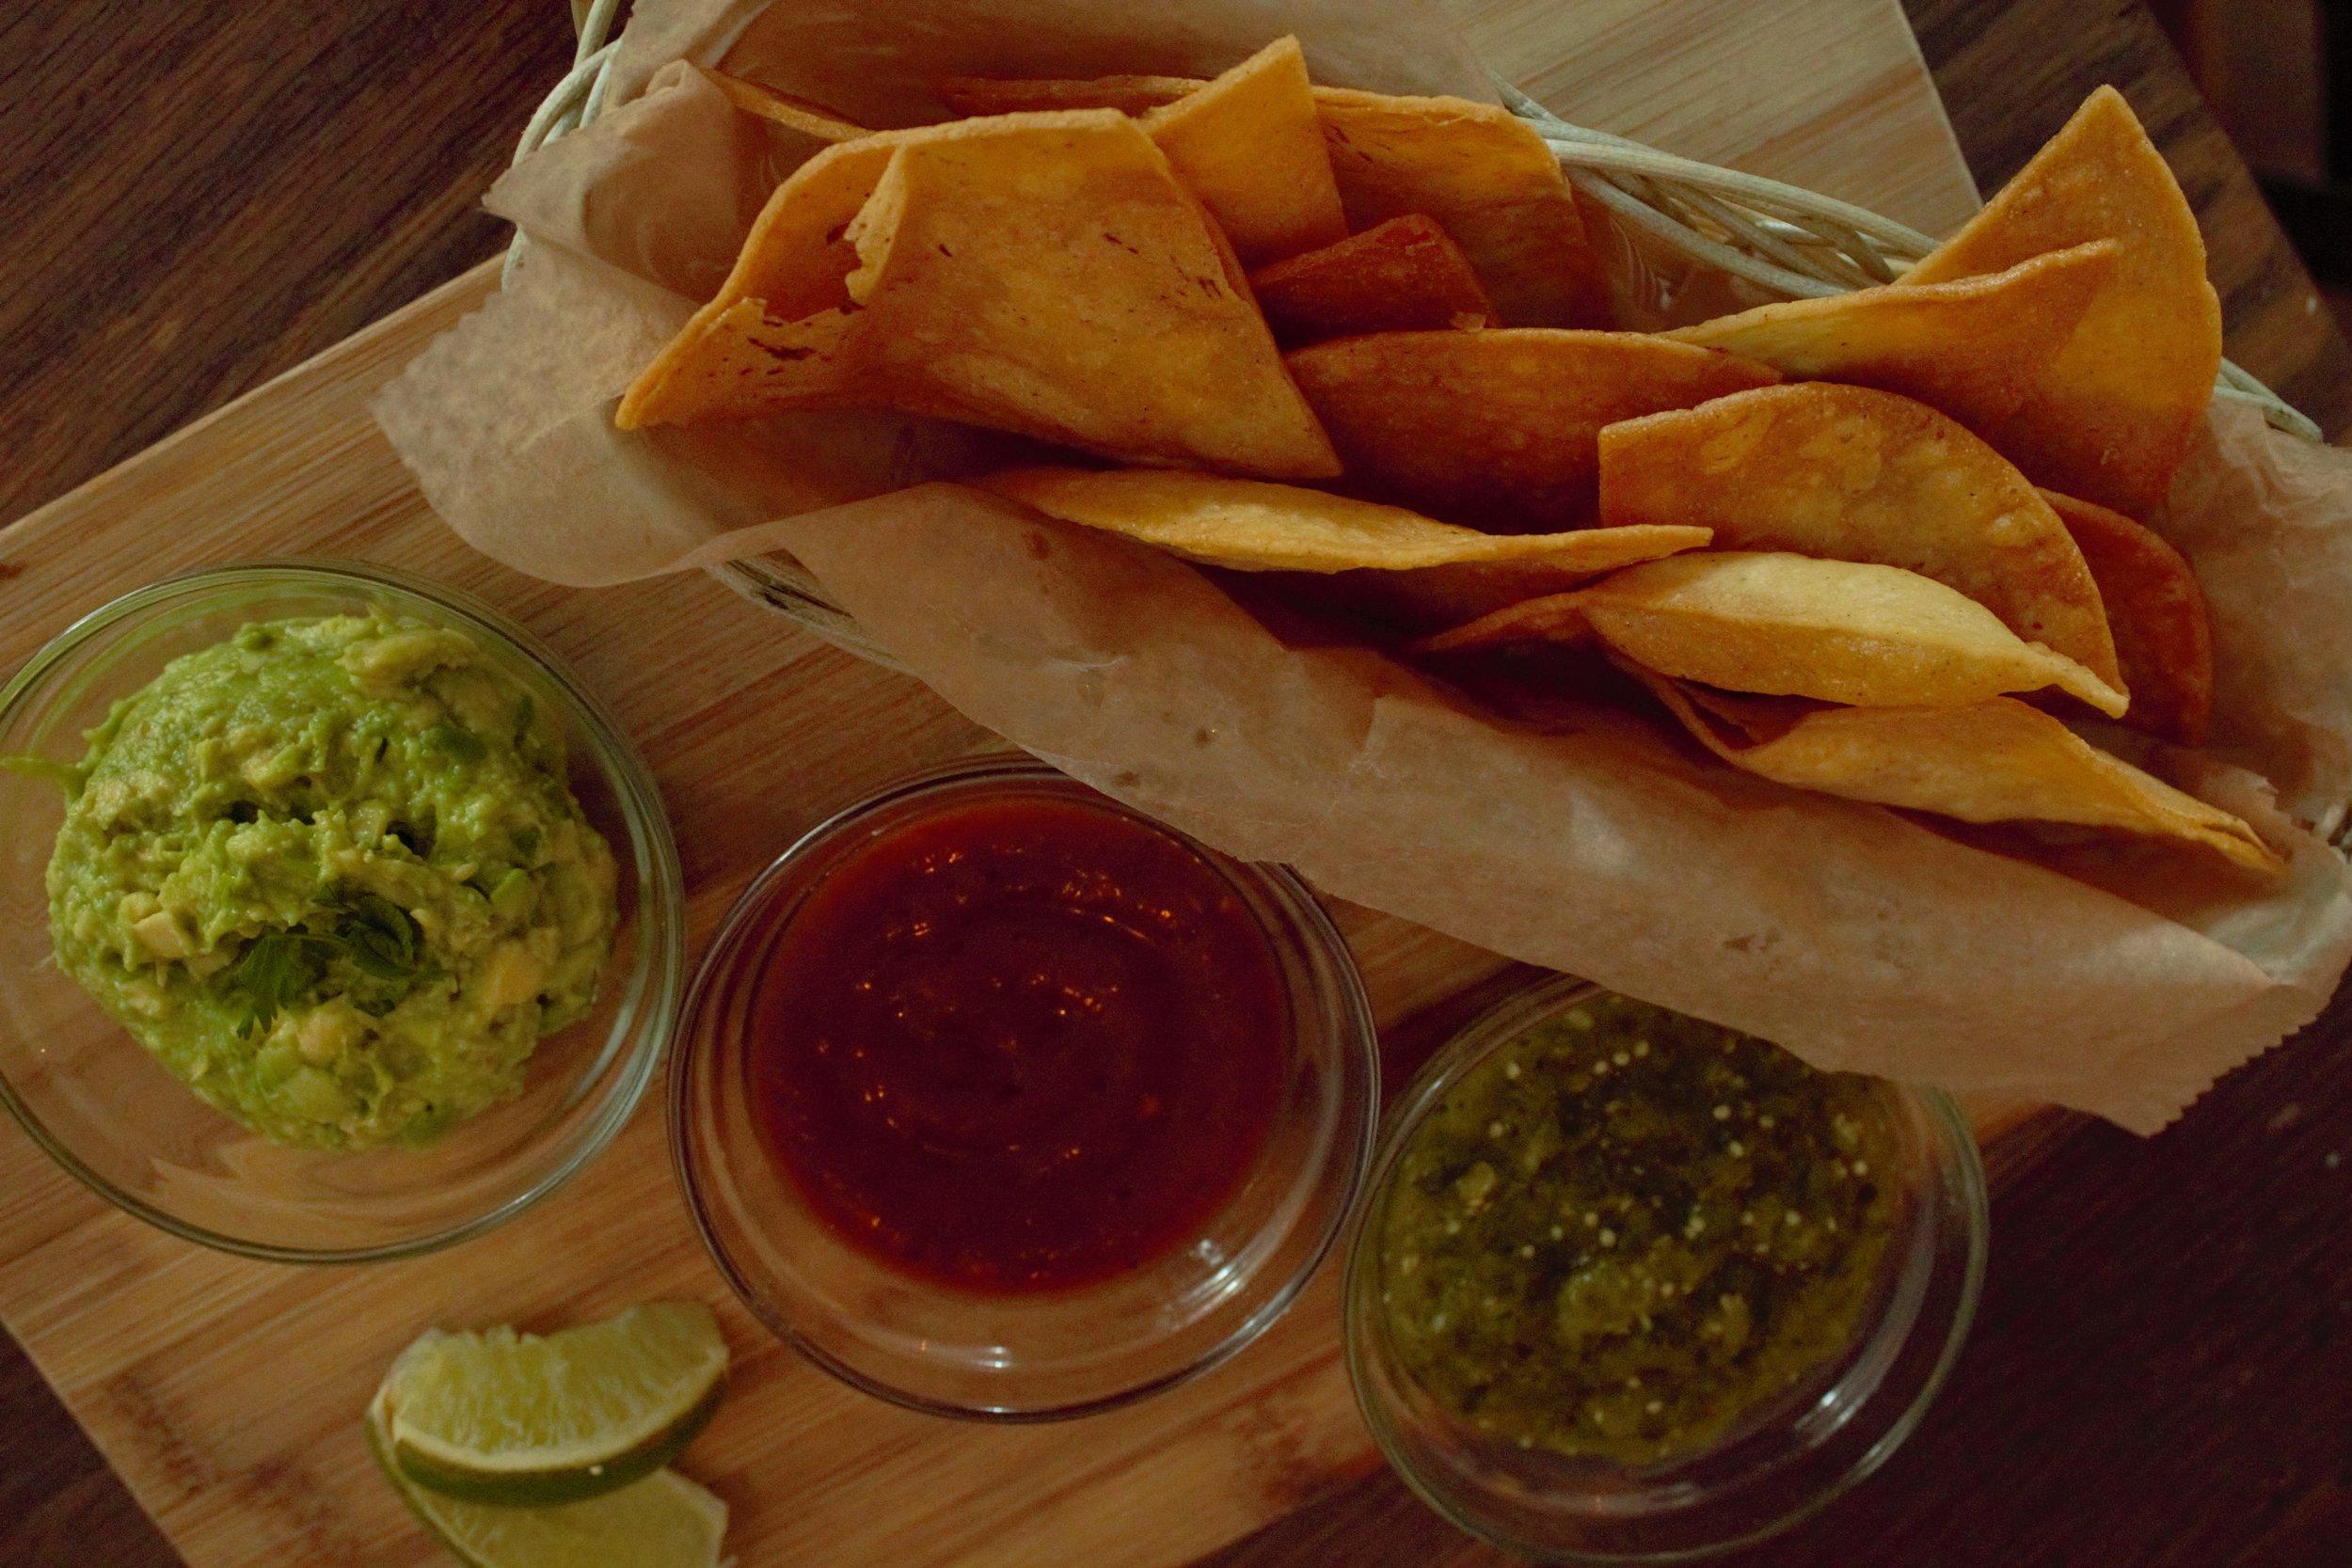 guacamole-sala-chips-appetizer-brooklyn-newyork-williamsburg-brunch-restaurant-local-organic-lunch-dinner-happyhour-happy-hour-clo-cafe.jpg